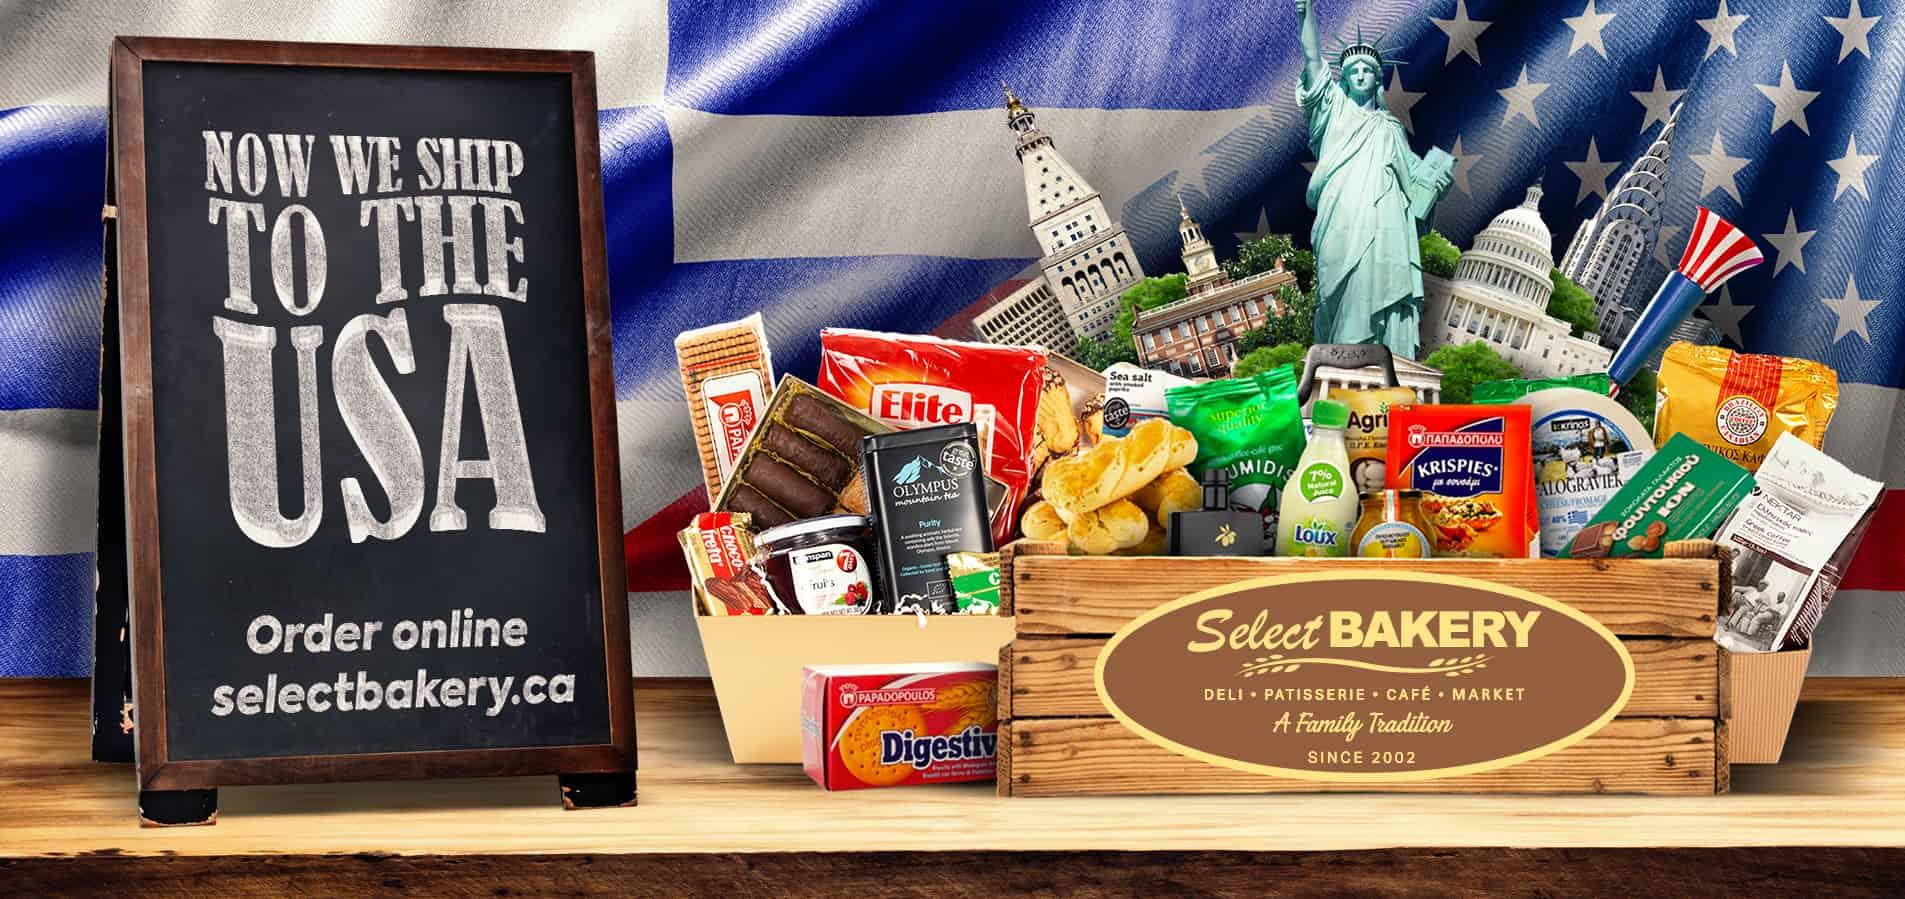 Select Bakery US shipping